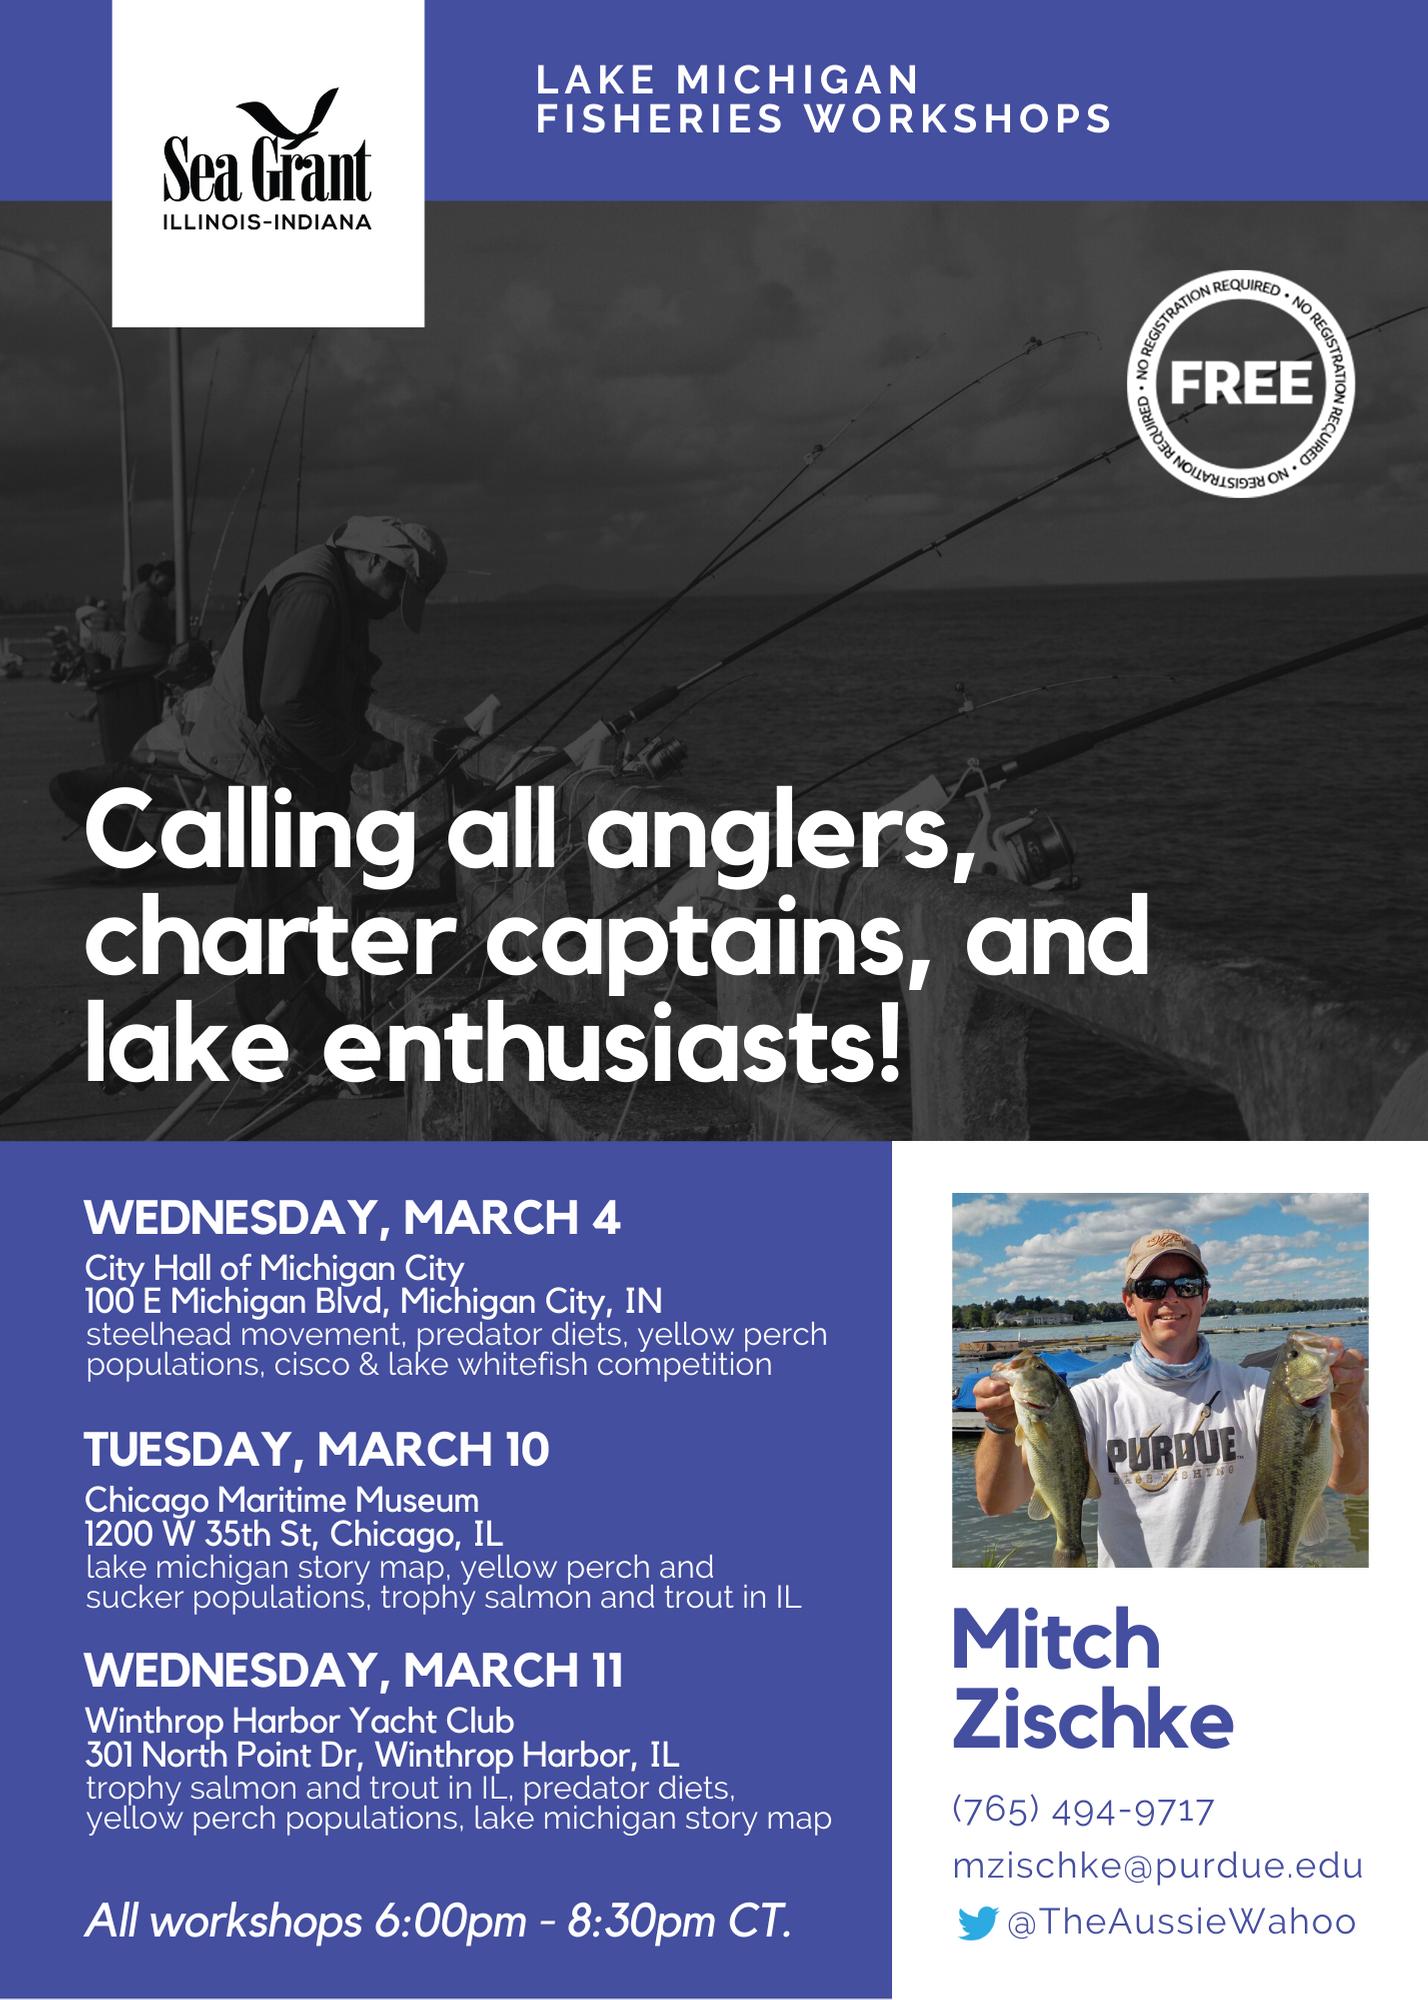 flyer for 2020 Lake Michigan fisheries workshops